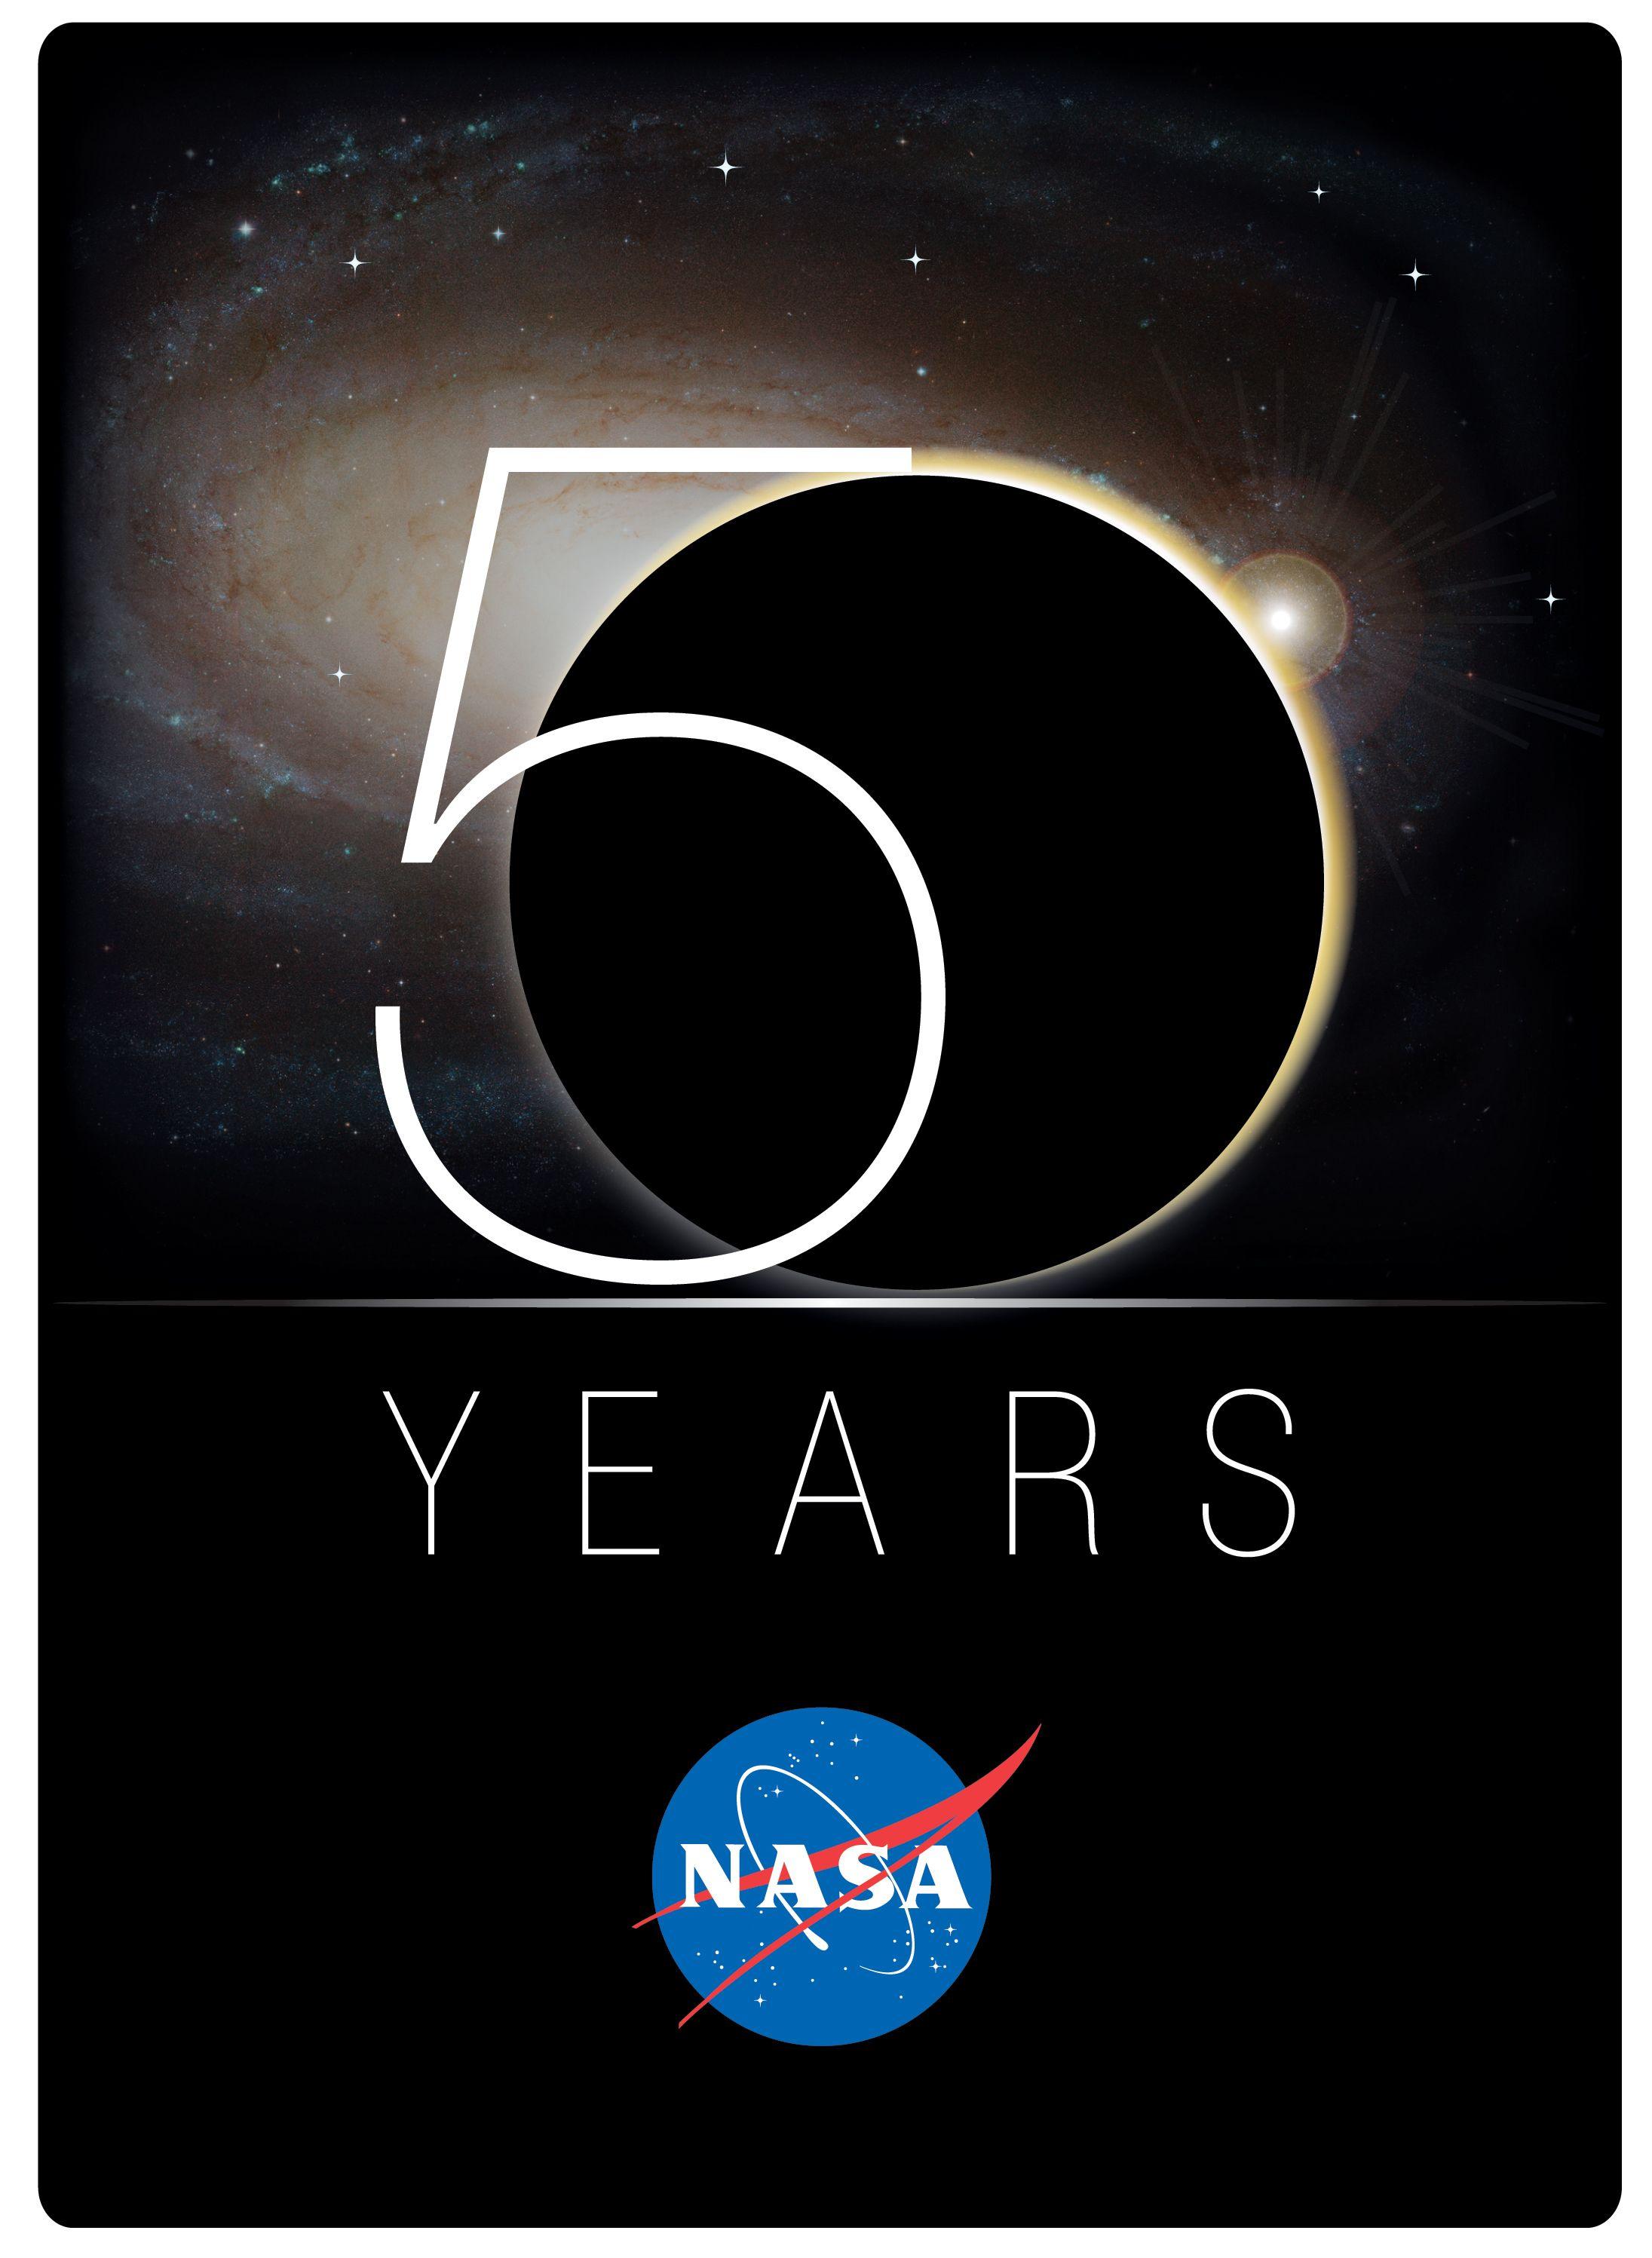 50th Anniversary logos Google Search 50th anniversary